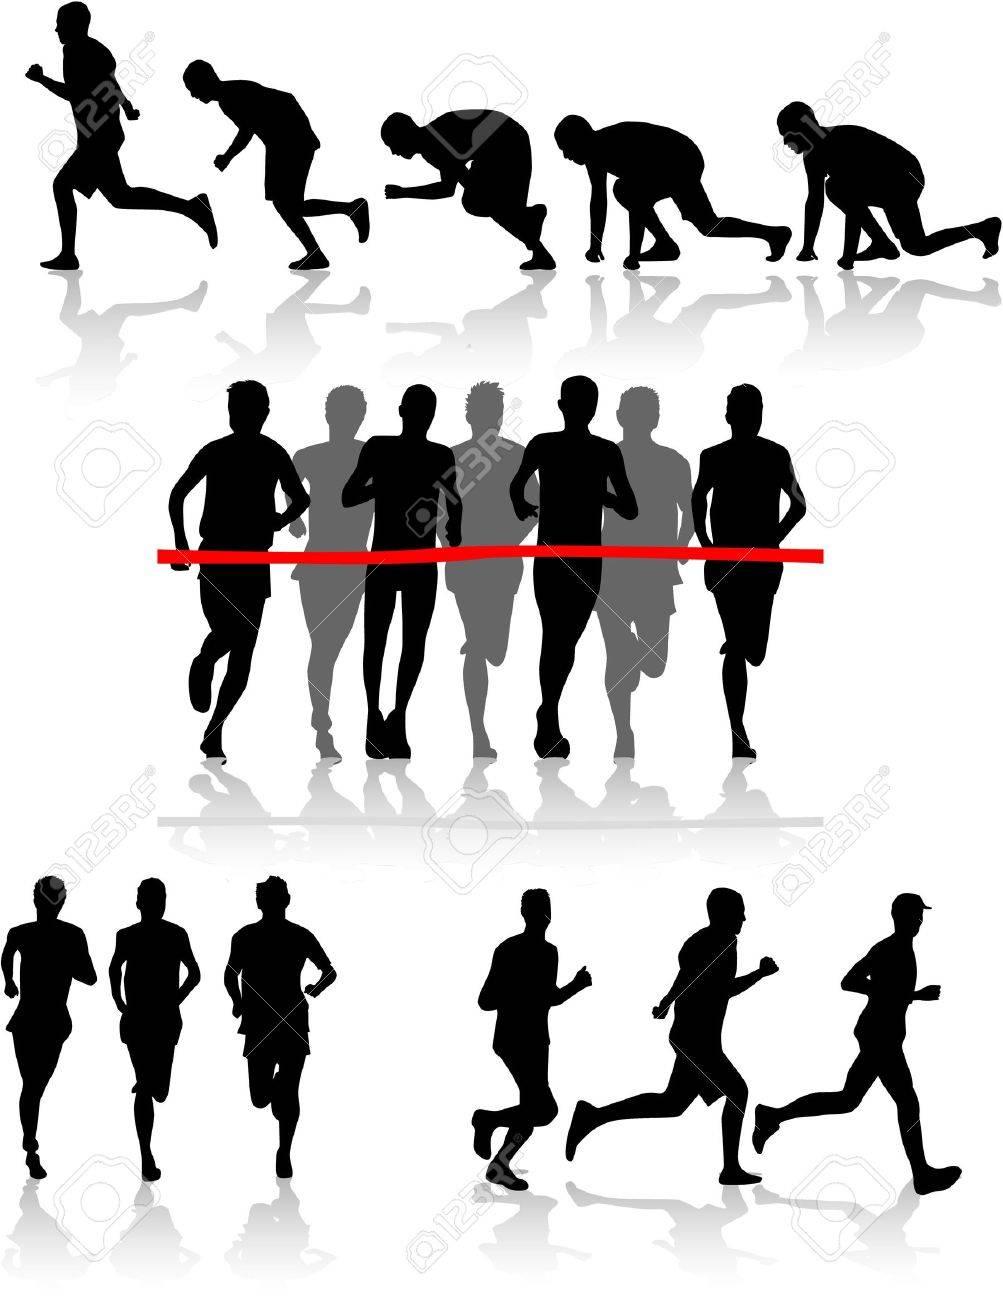 Runners Stock Vector - 9718608